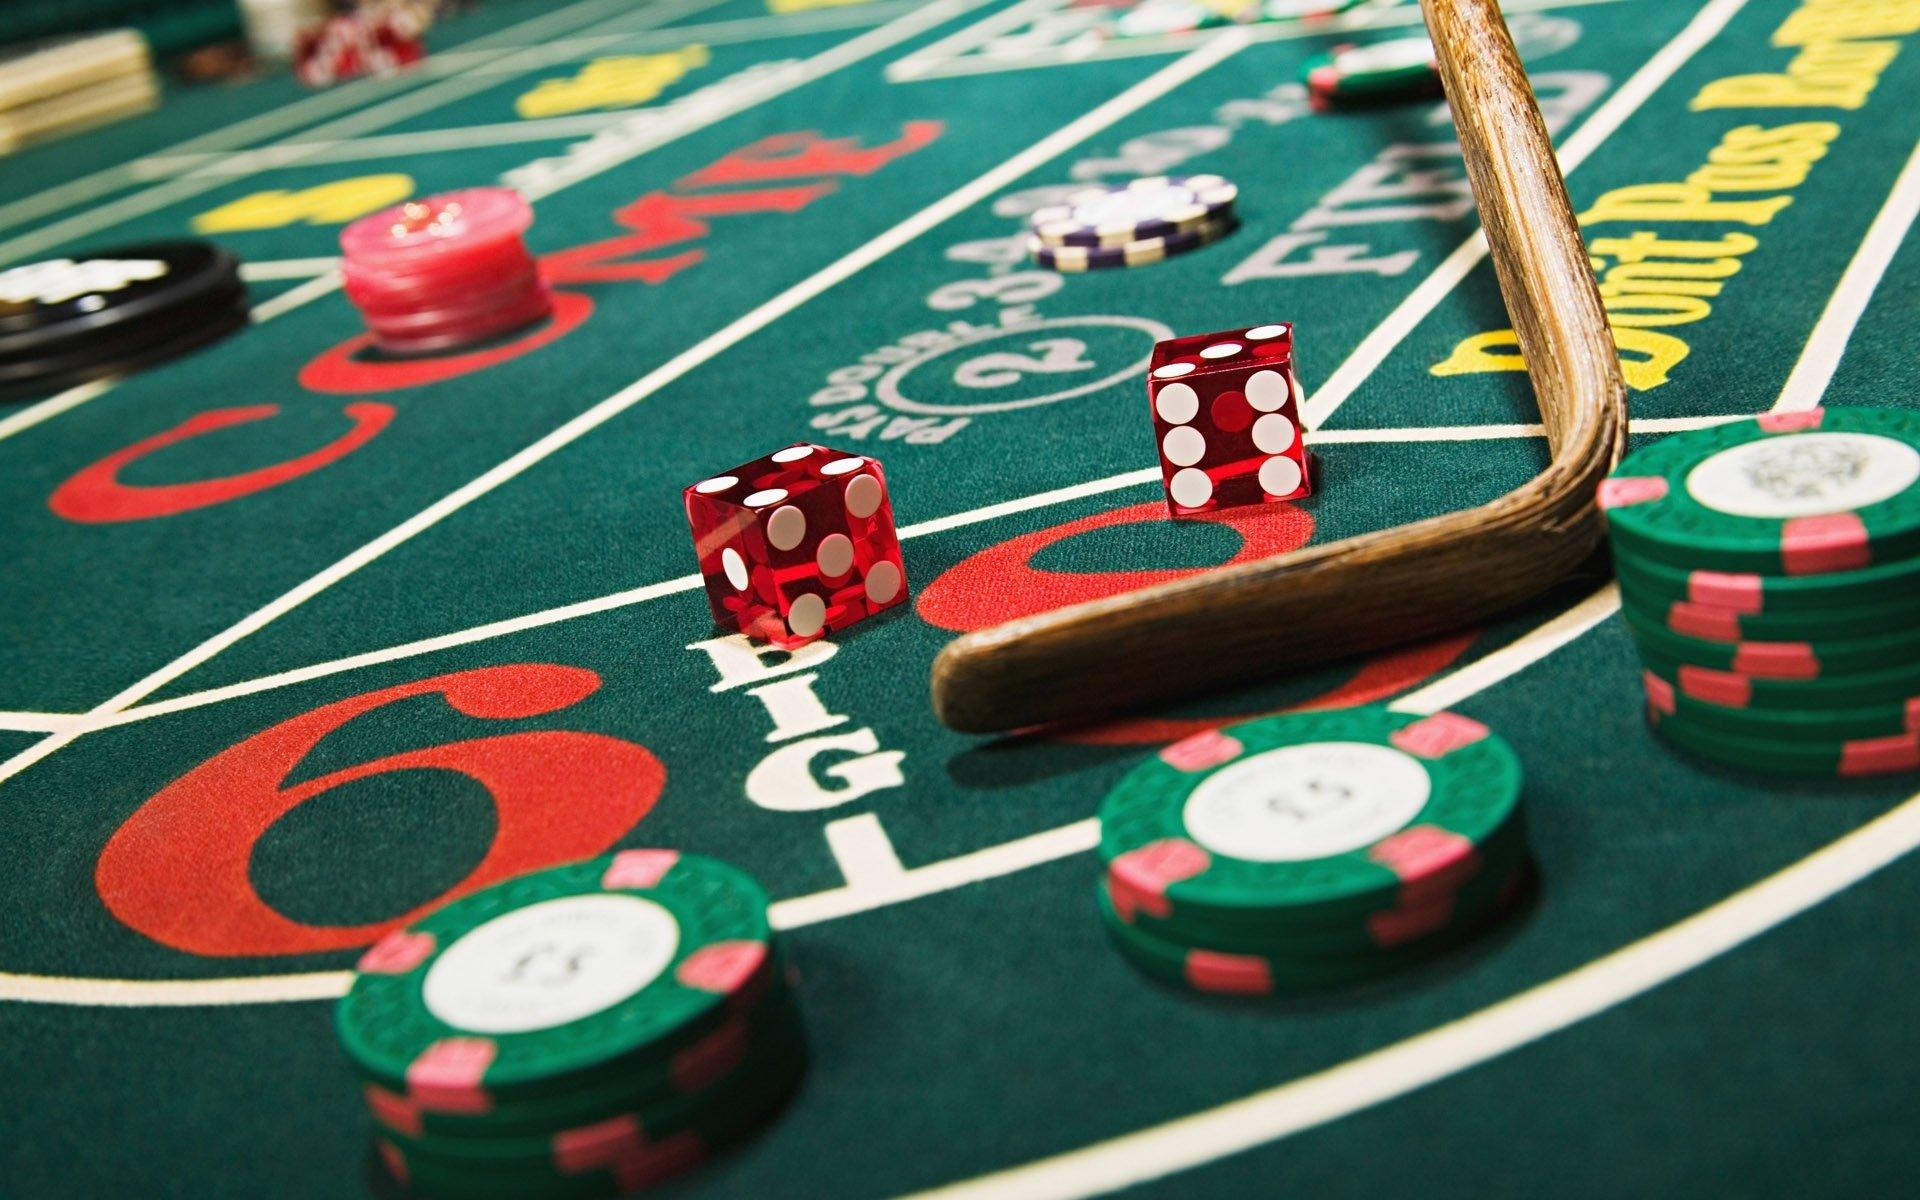 casino-bg - Casino Event Hire